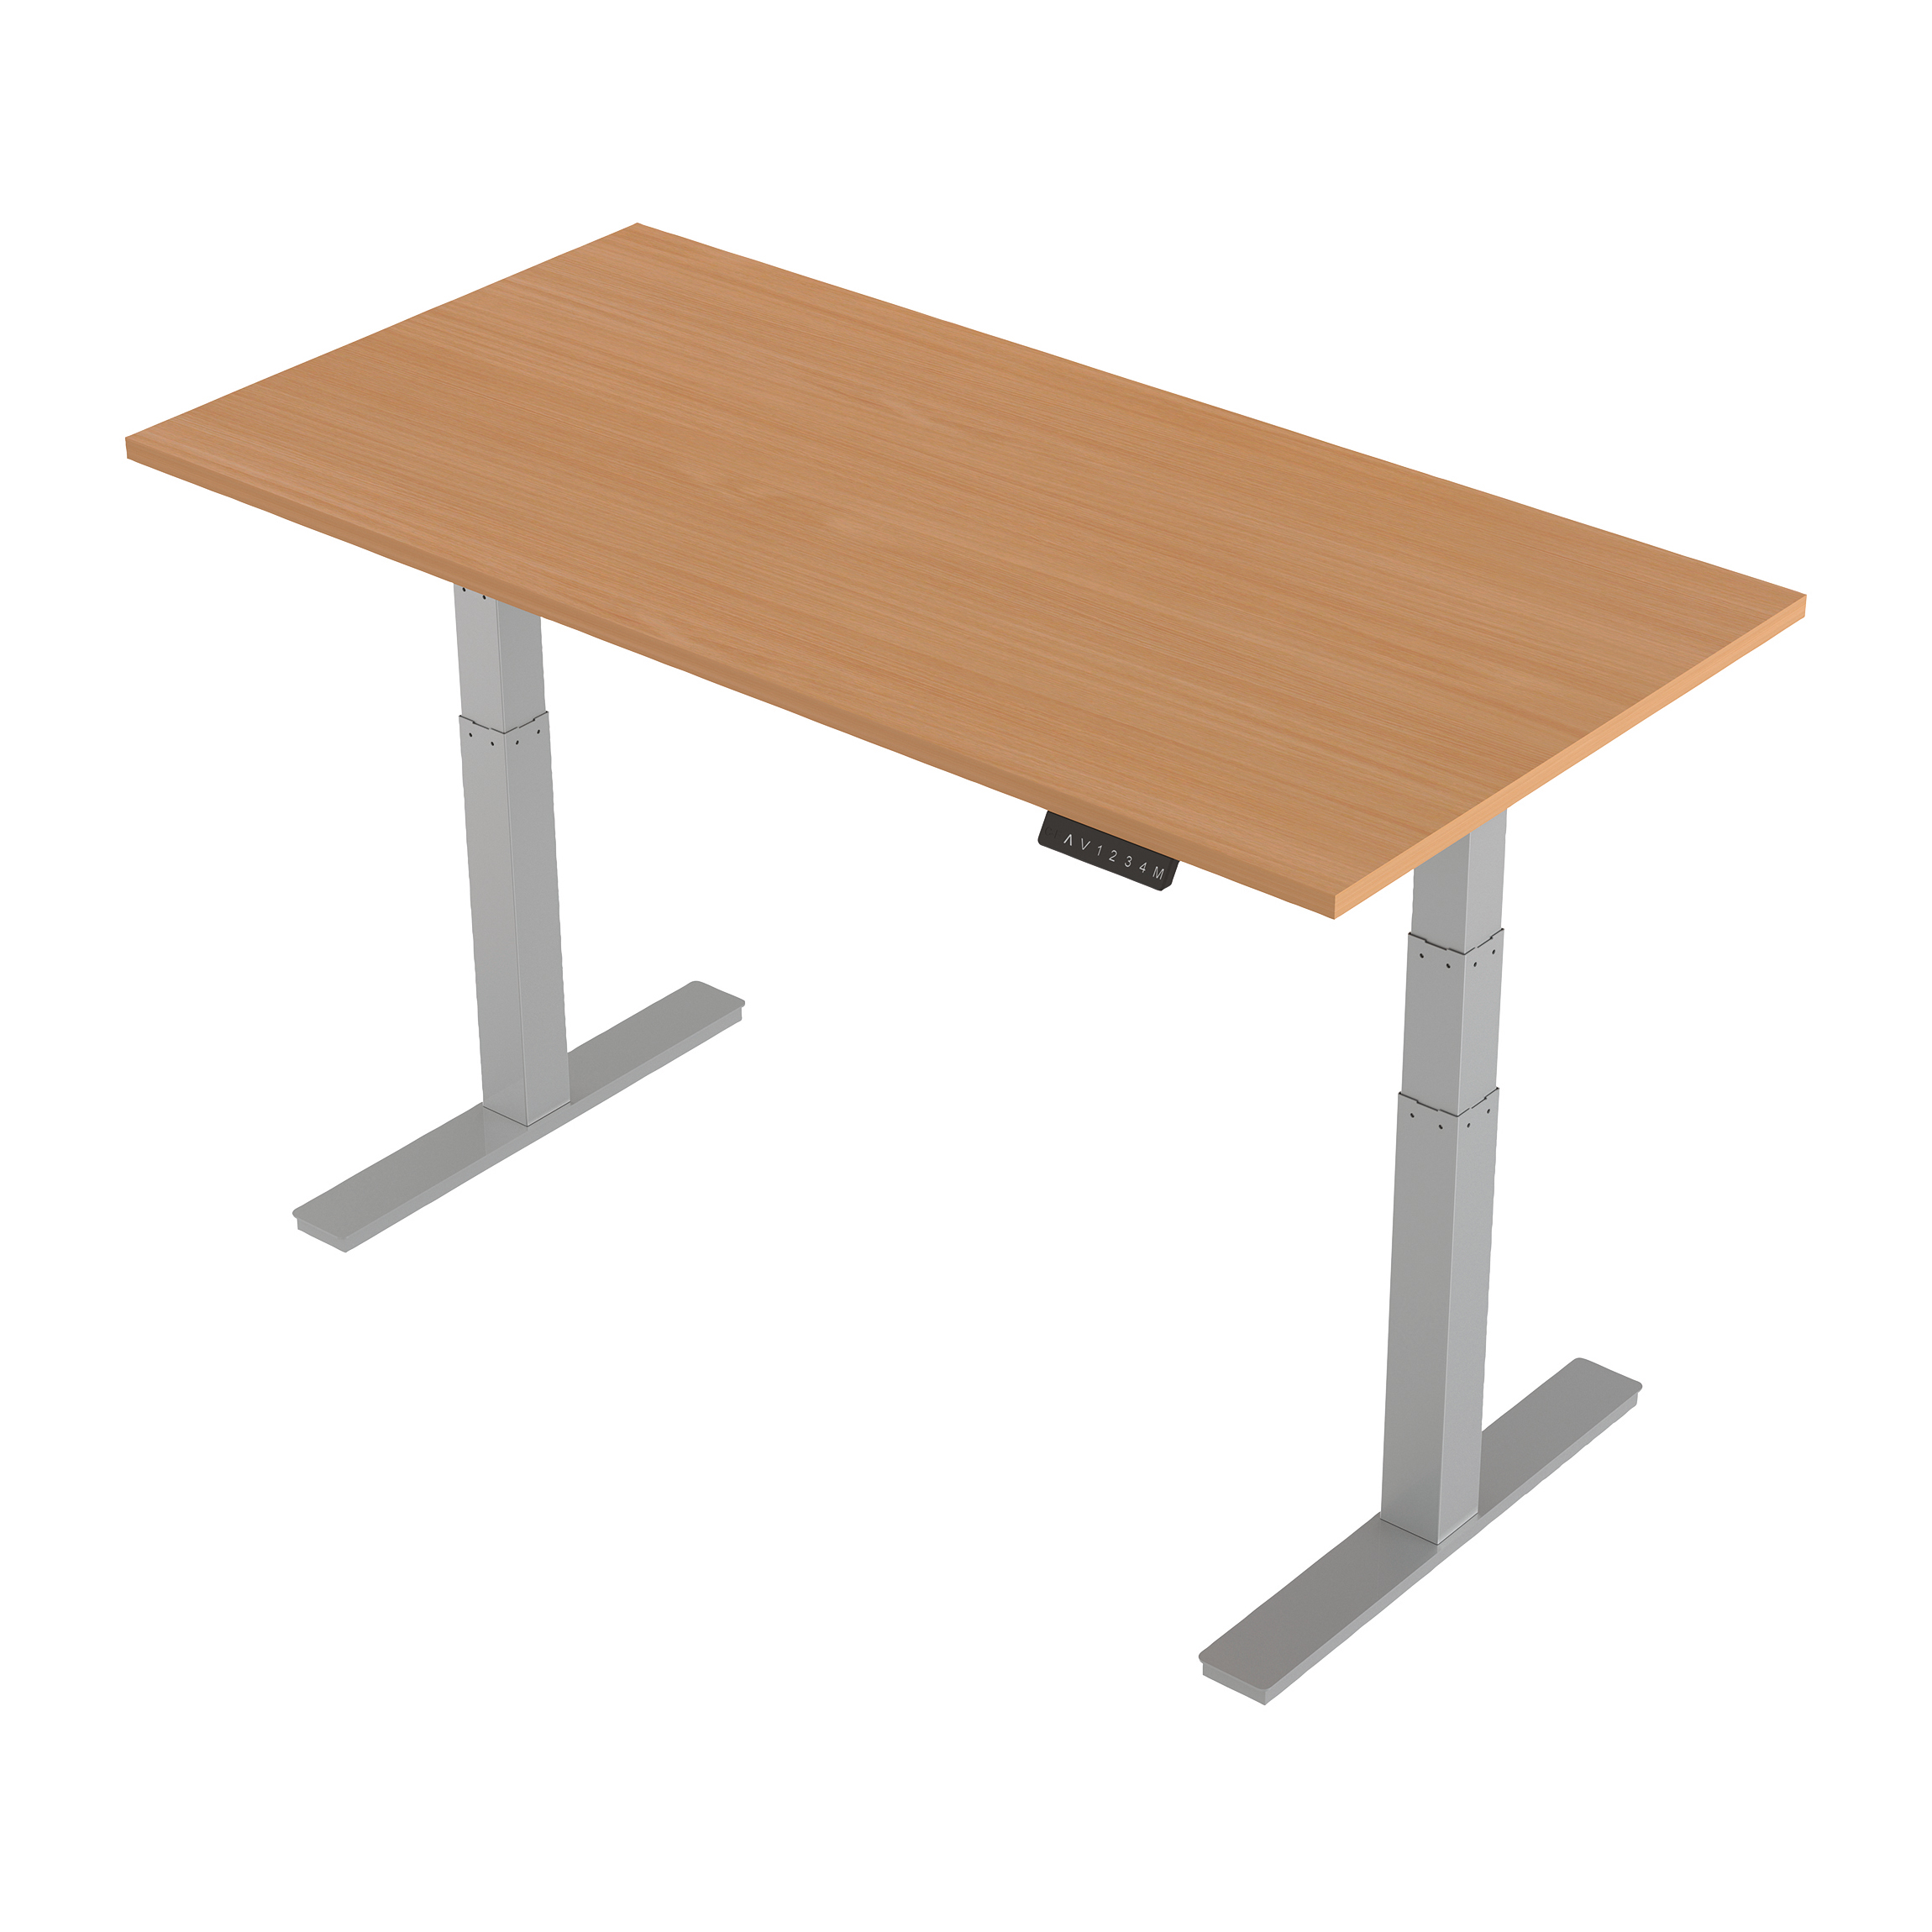 Trexus Sit-Stand Desk Height-adjustable Silver Leg Frame 1600/800mm Beech Ref HA01003